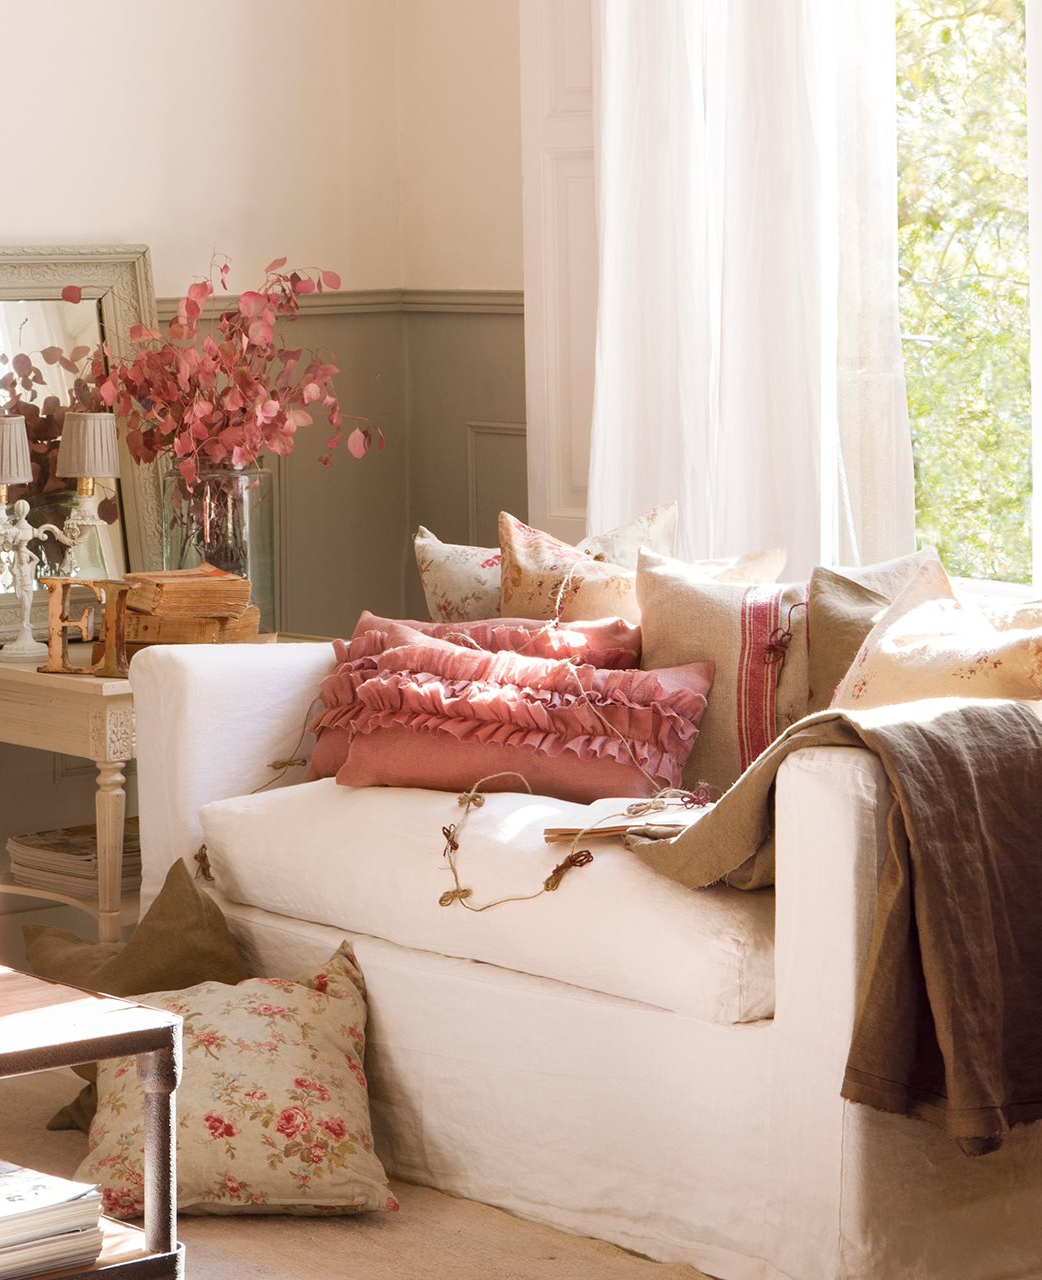 Cojines Grandes Para sofas Wddj El Poder De Los Cojines Un sofà De Revista